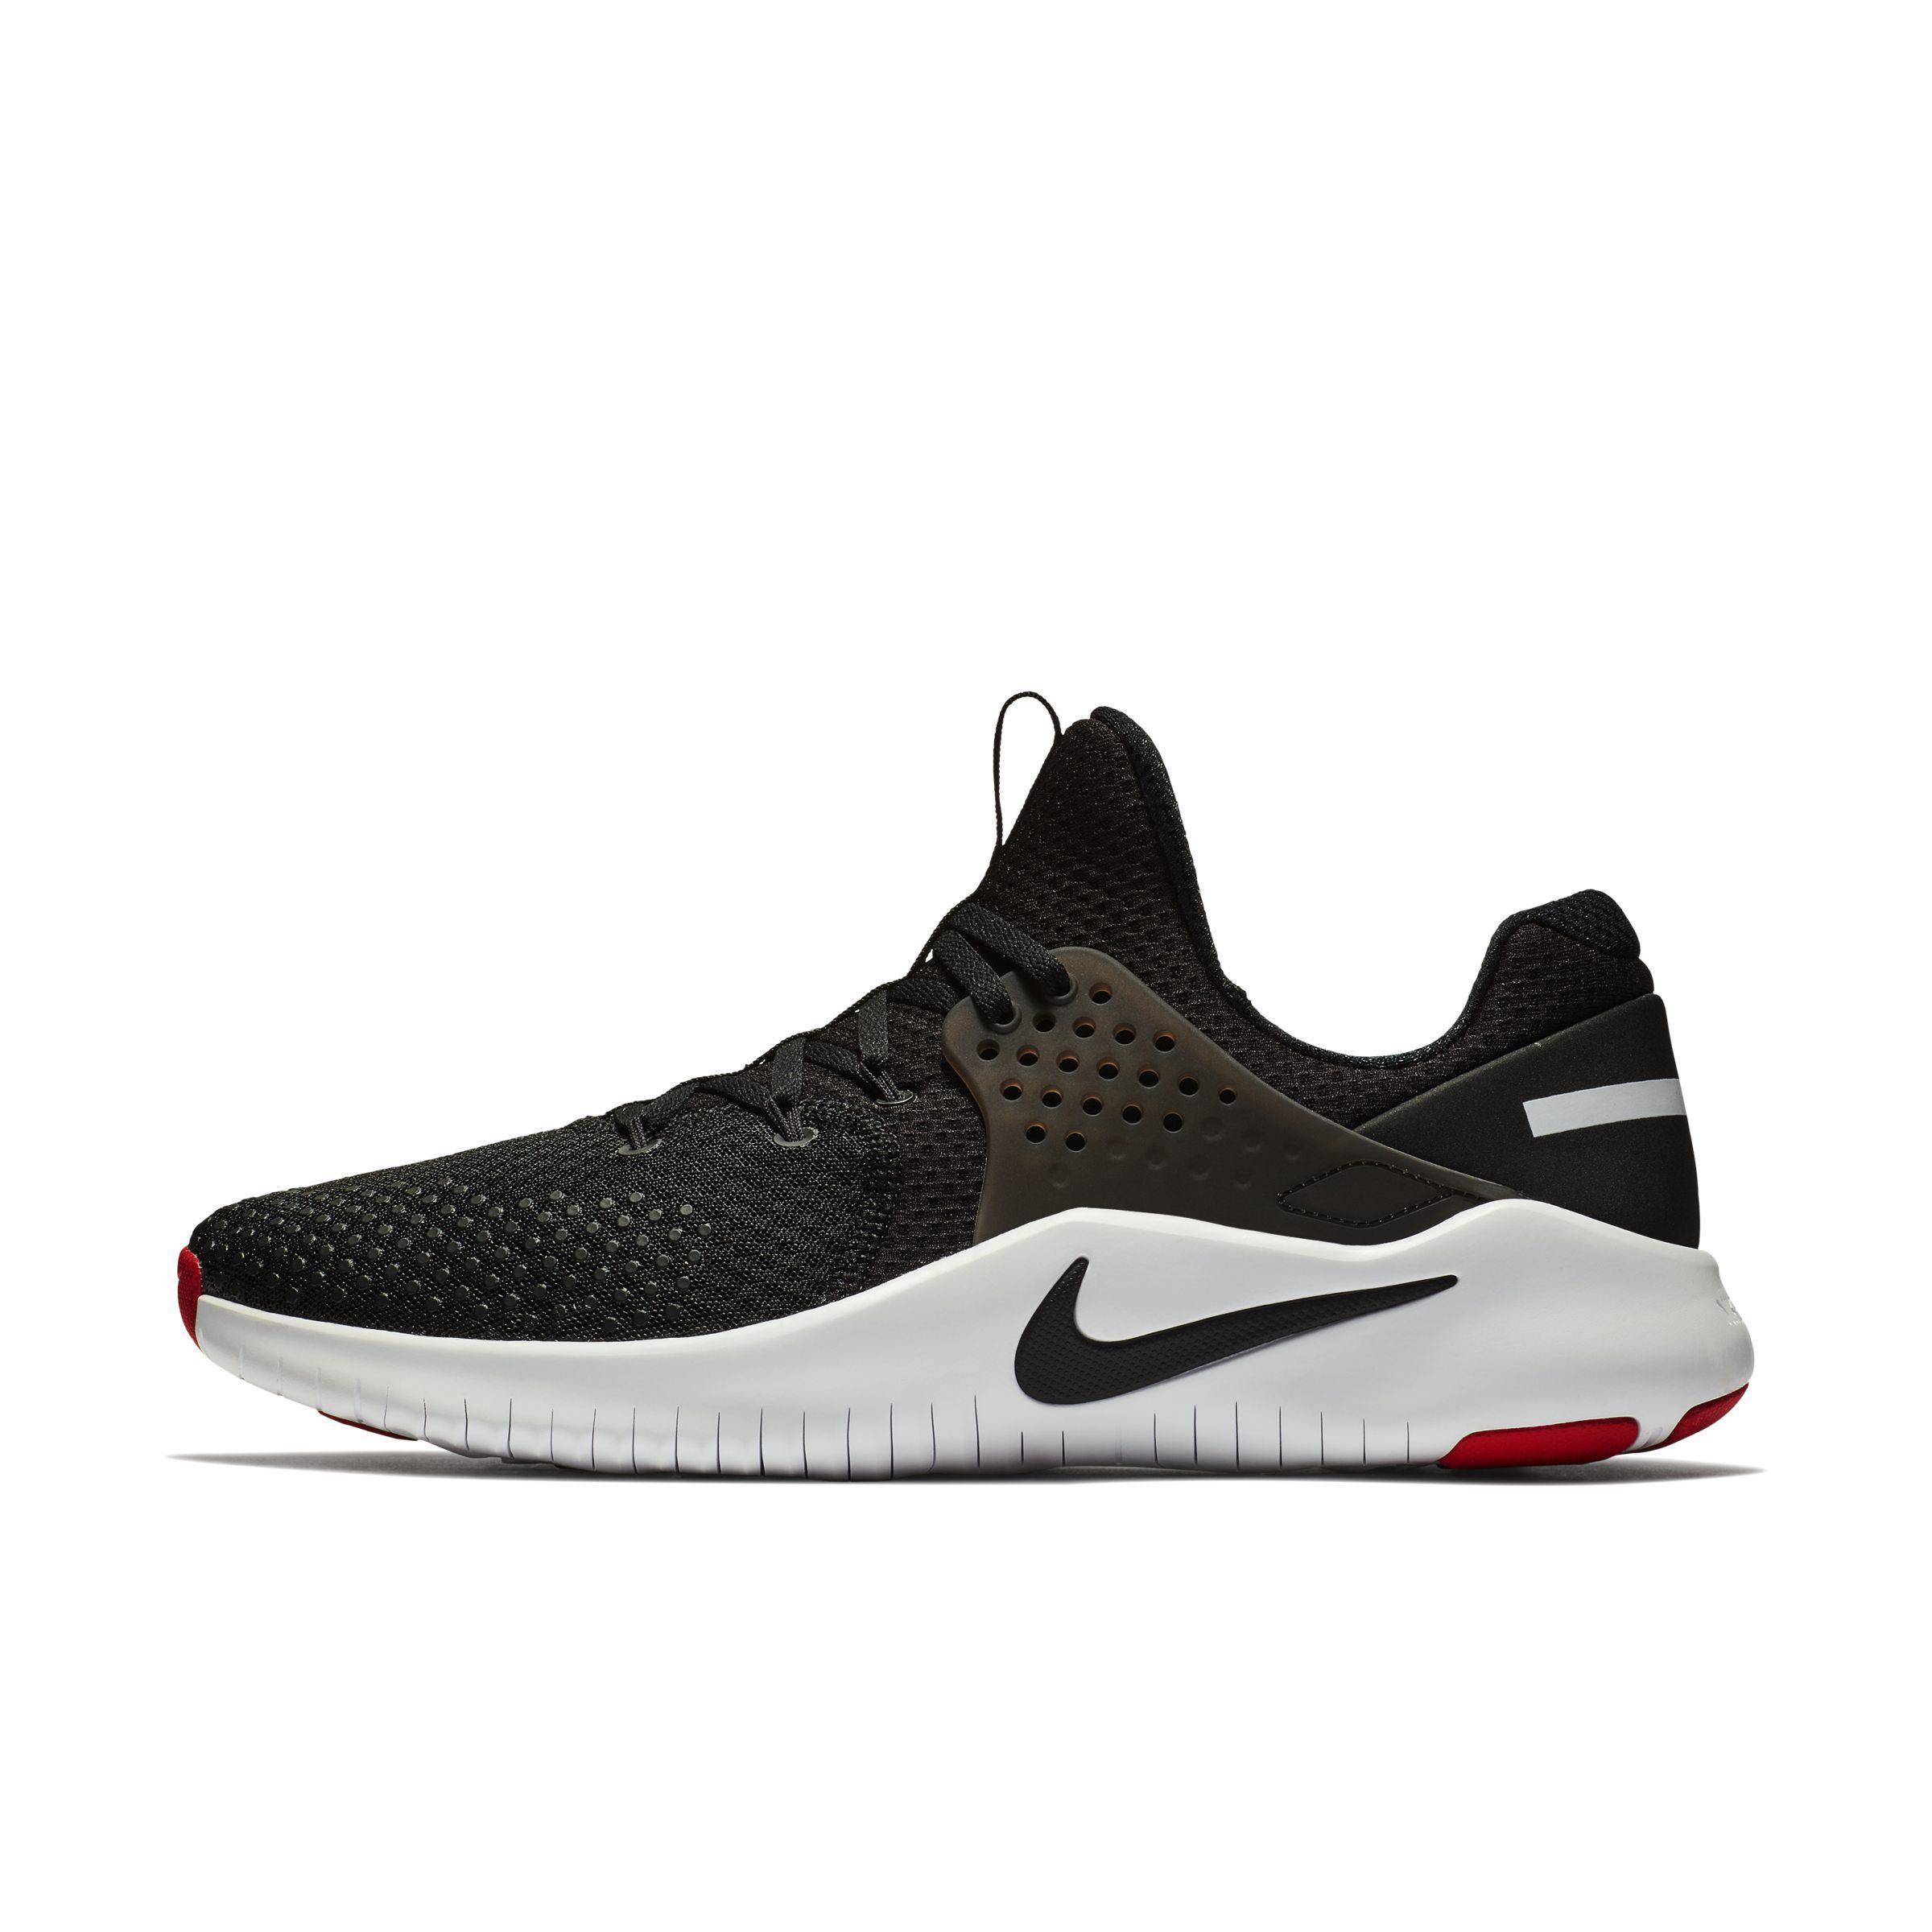 df8688215715c Nike Free Tr V8 Gym hiit cross Training Shoe in Black for Men - Lyst